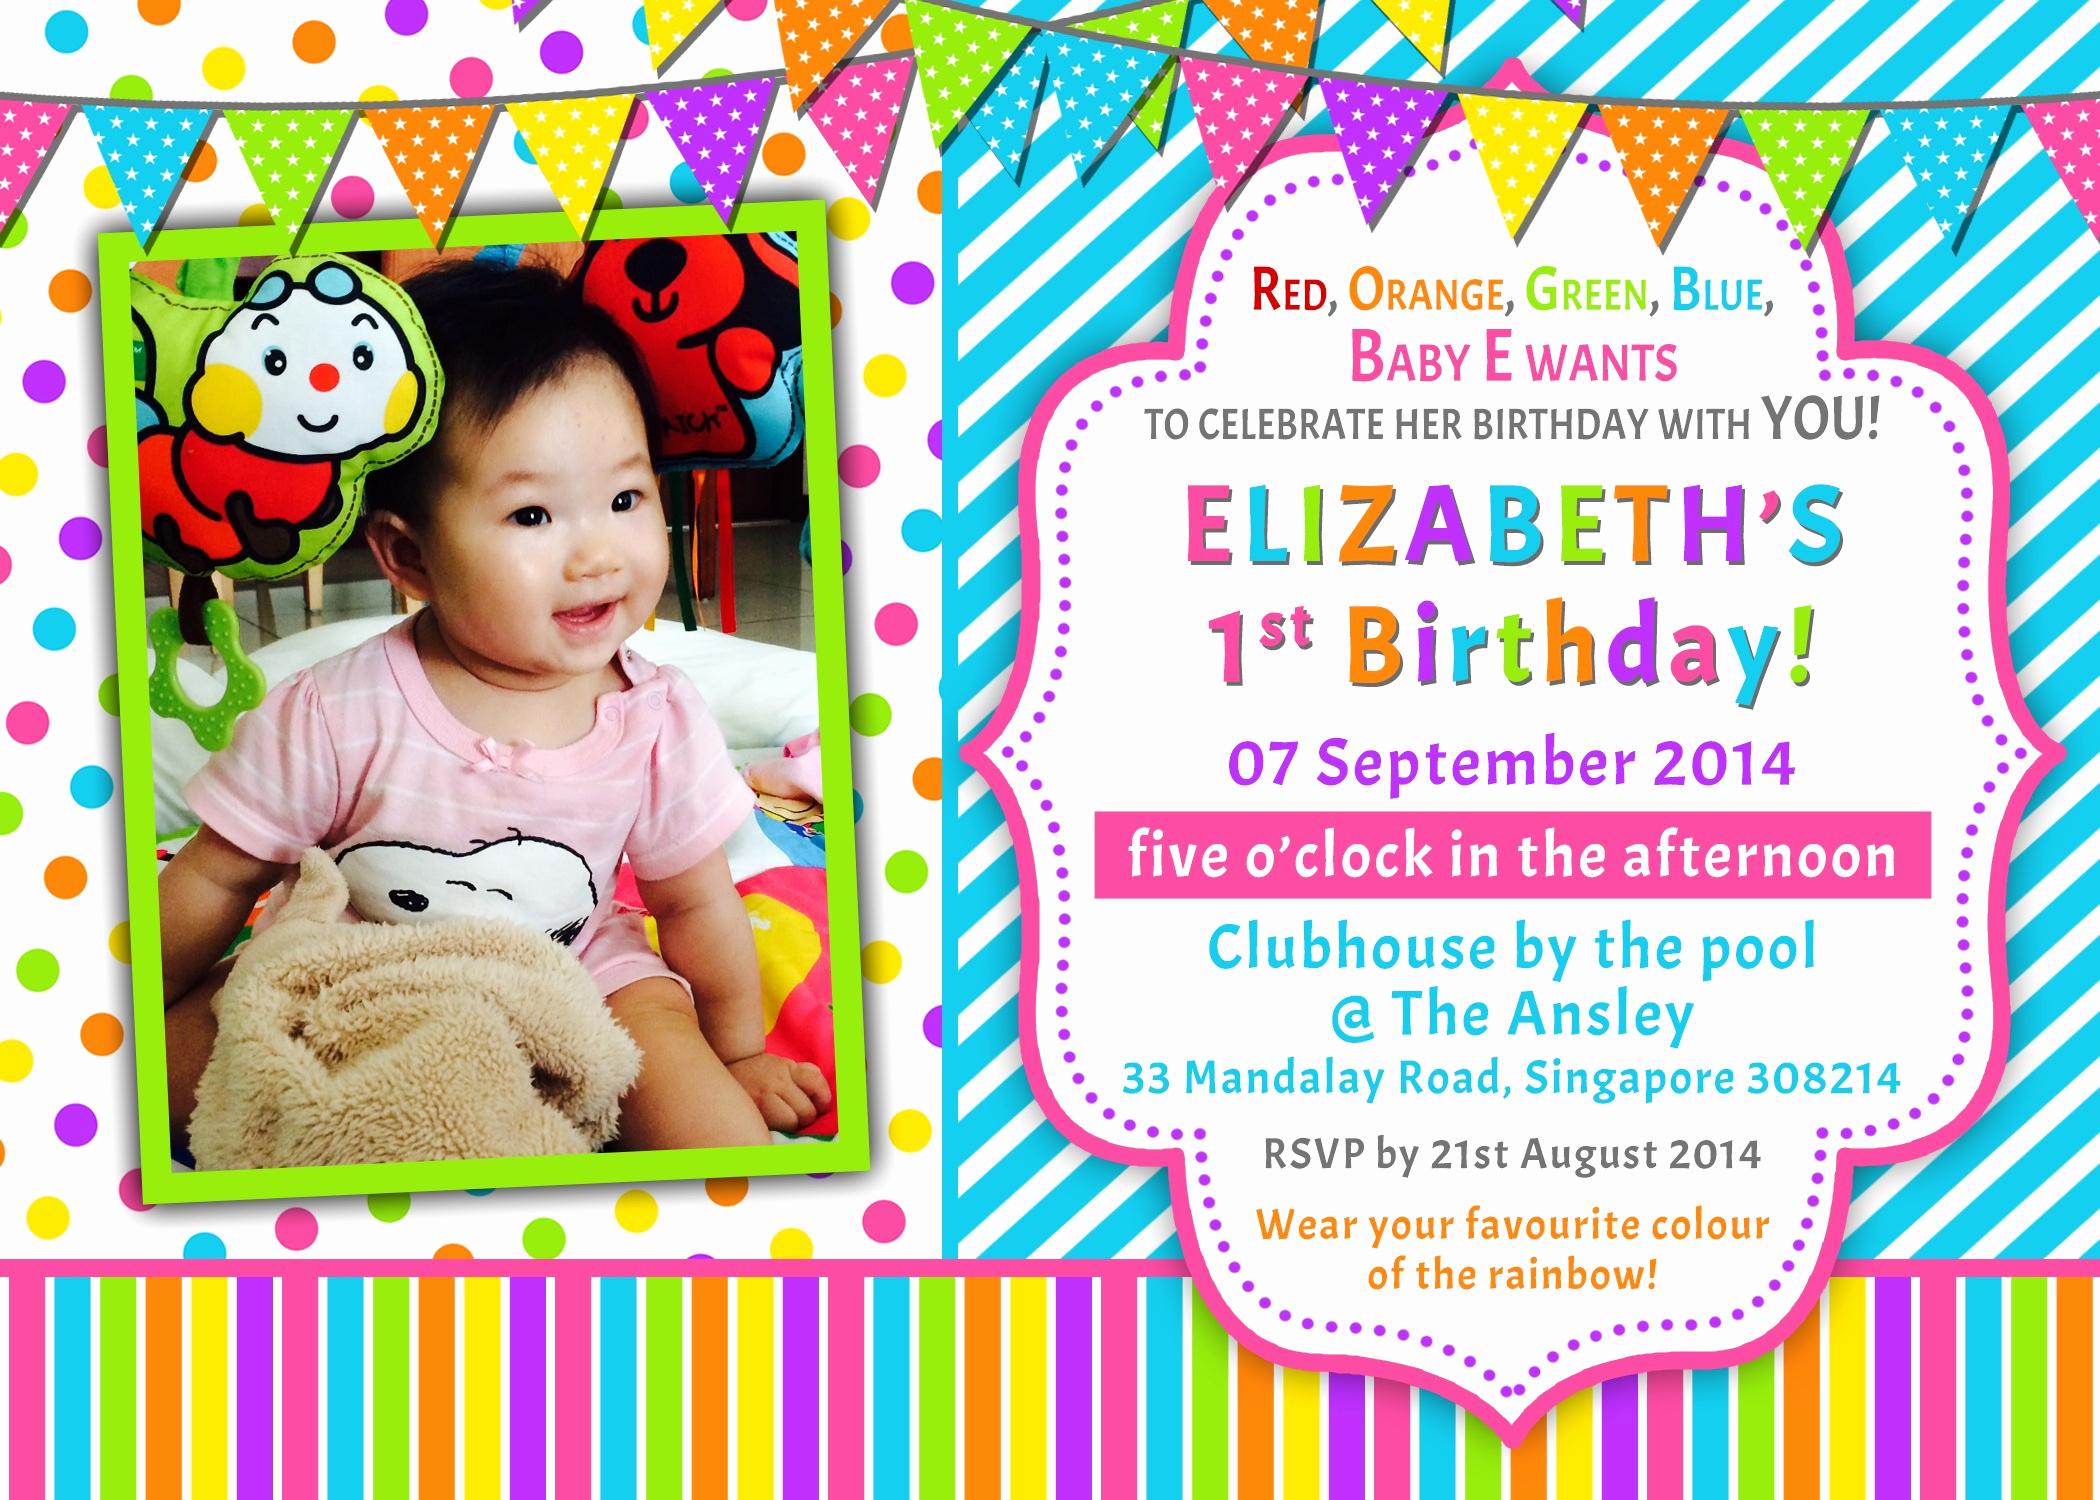 Baby 1st Birthday Invitation Lovely Preparations for Baby E's Birthday